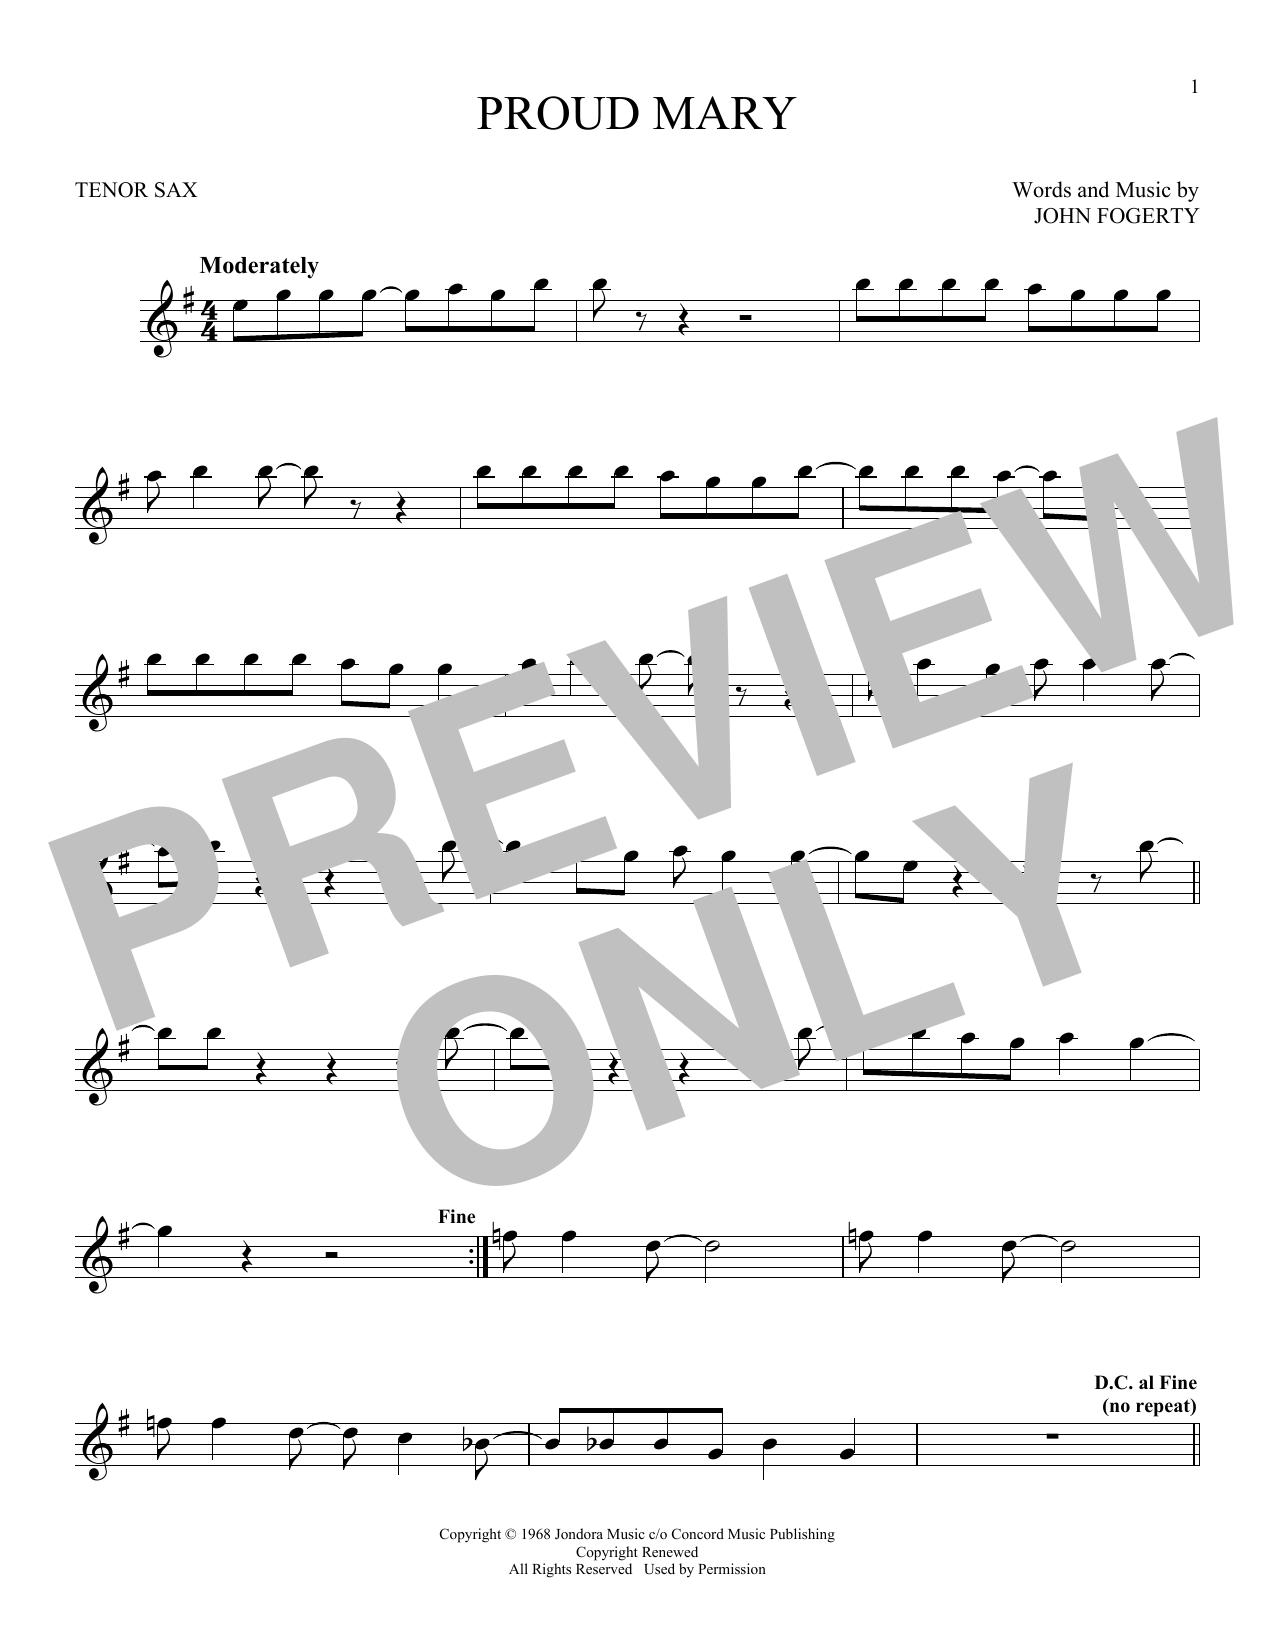 Sheet Music Digital Files To Print Licensed John Fogerty Digital